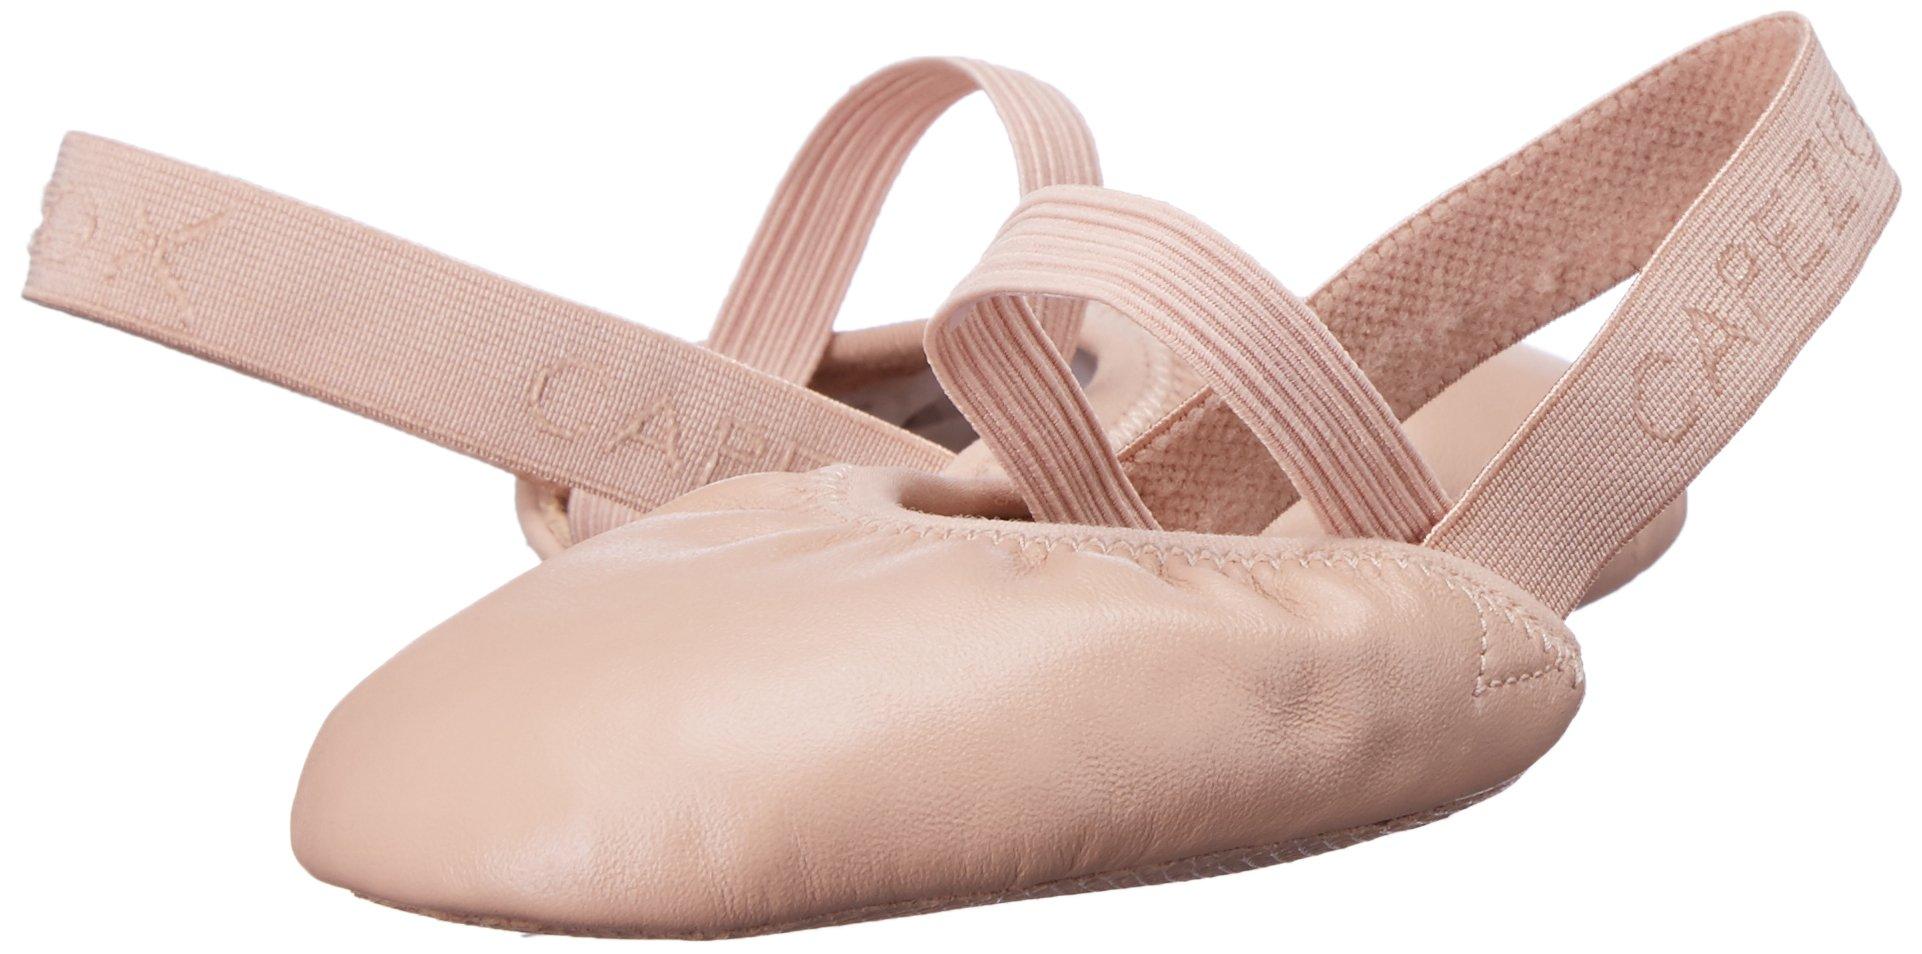 Capezio Turning Pointe 55 Women Dance Shoe, Nude, Large/10-11.5 M US